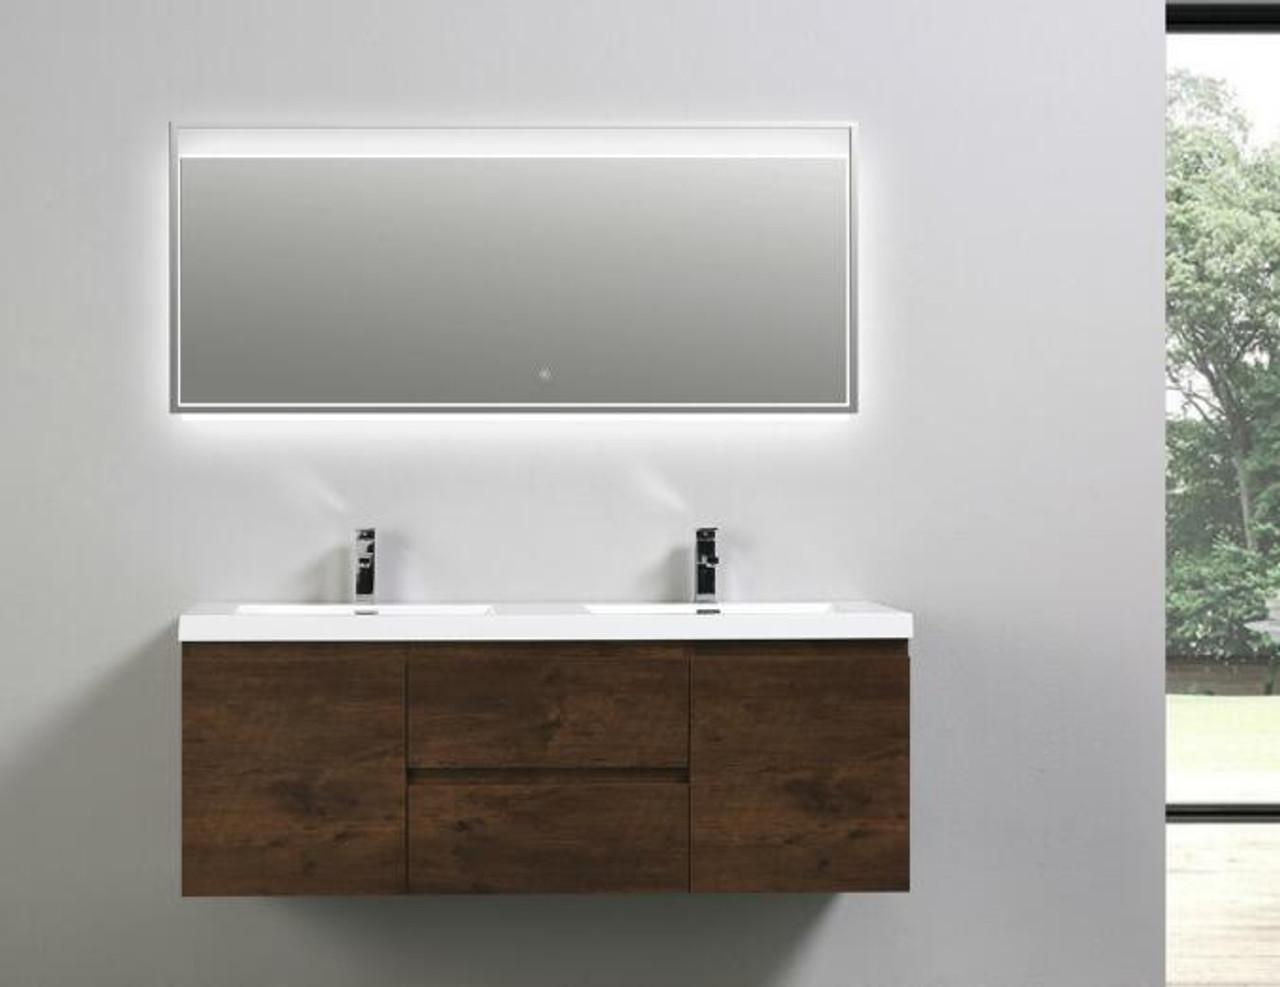 Moreno Mob 60 Double Sink Rosewood Wall Mounted Modern Bathroom Vanity With Reeinforced Acrylic